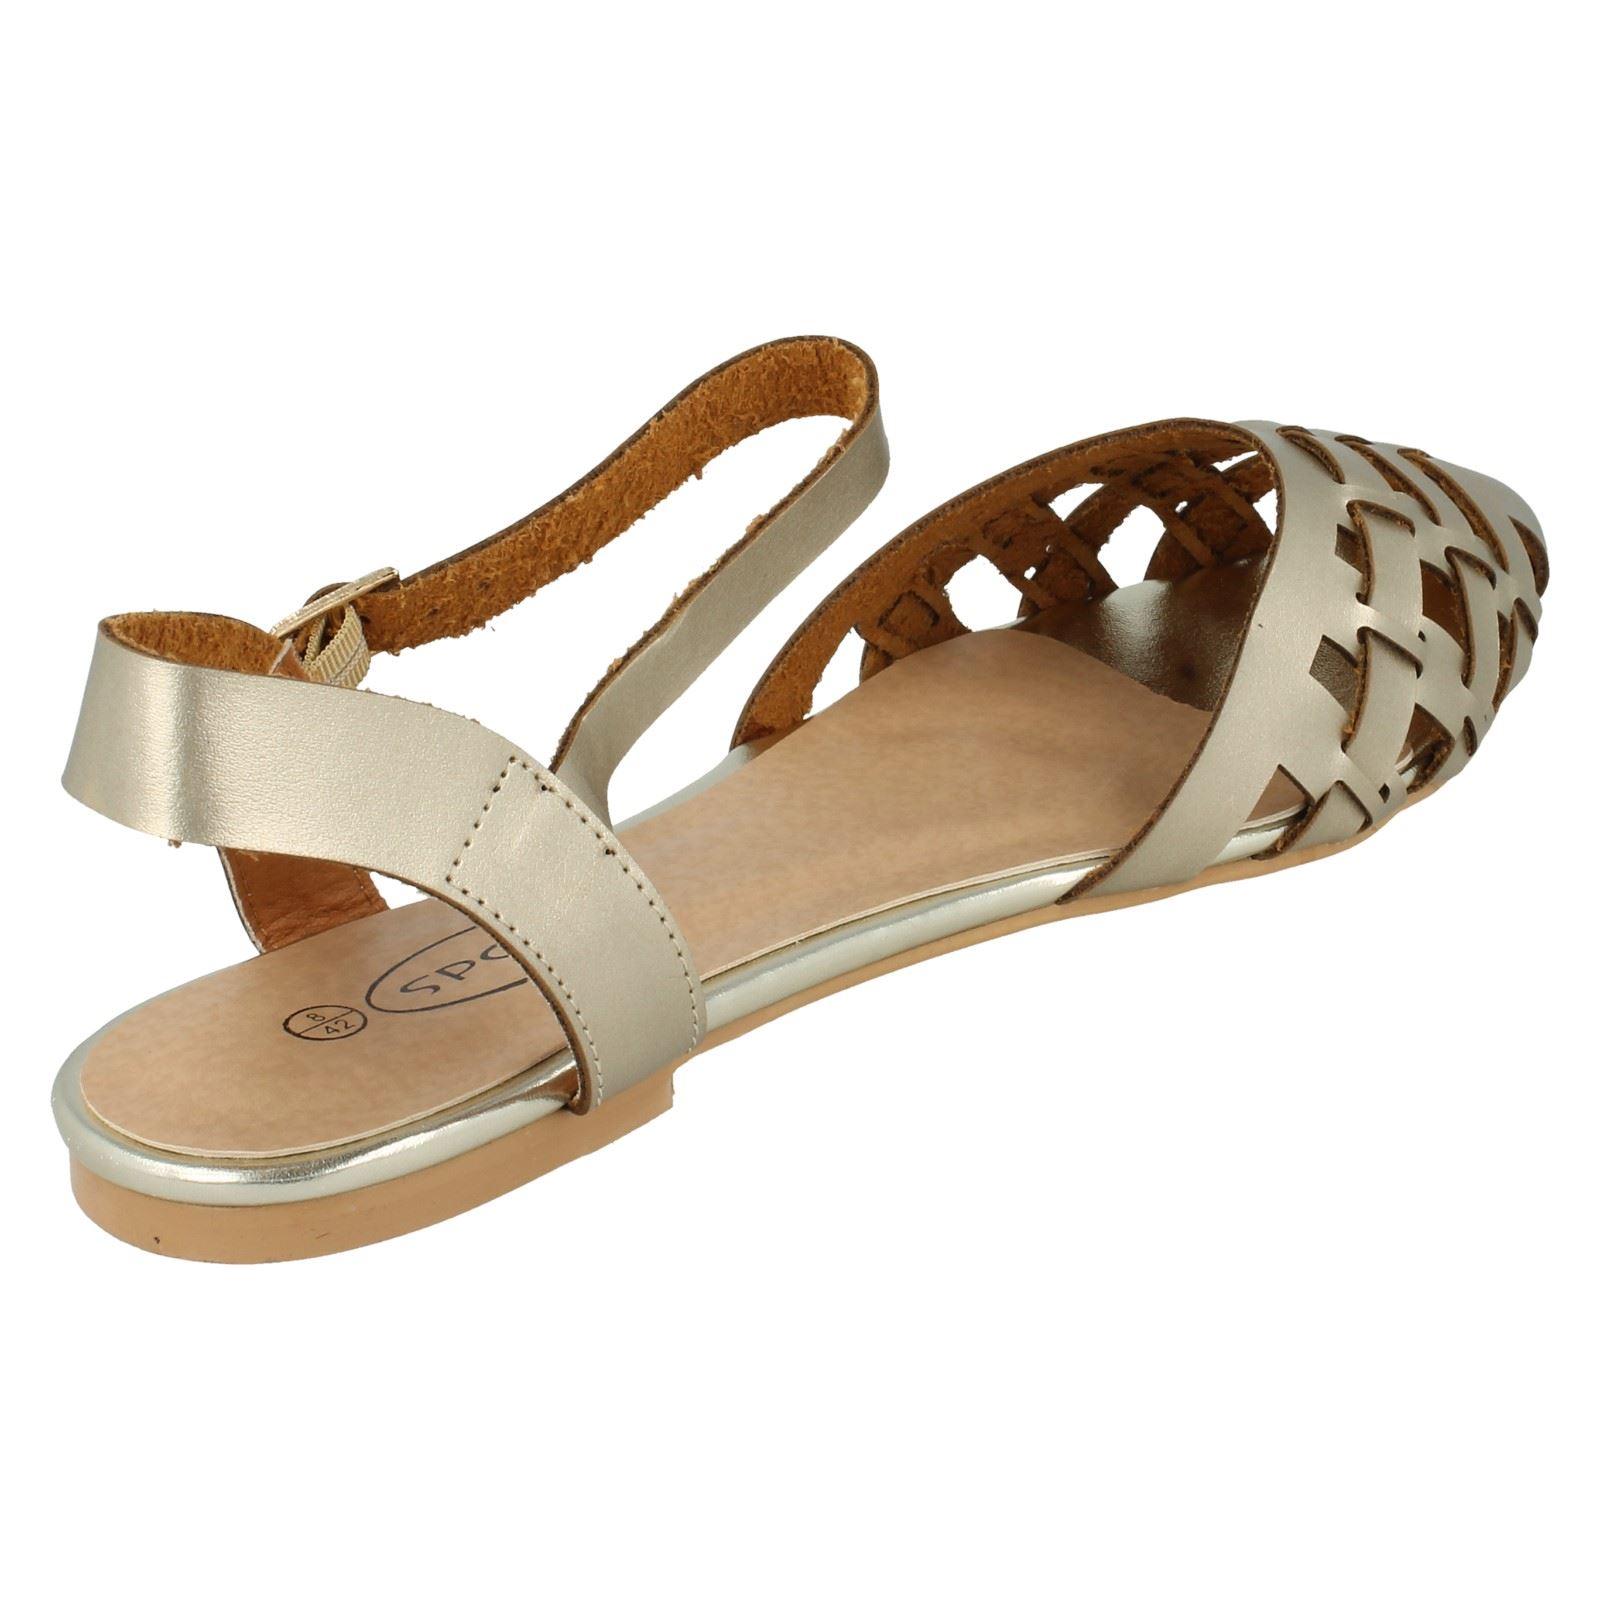 damen synthetisch sommer sandalen spot on style f0956 ebay. Black Bedroom Furniture Sets. Home Design Ideas